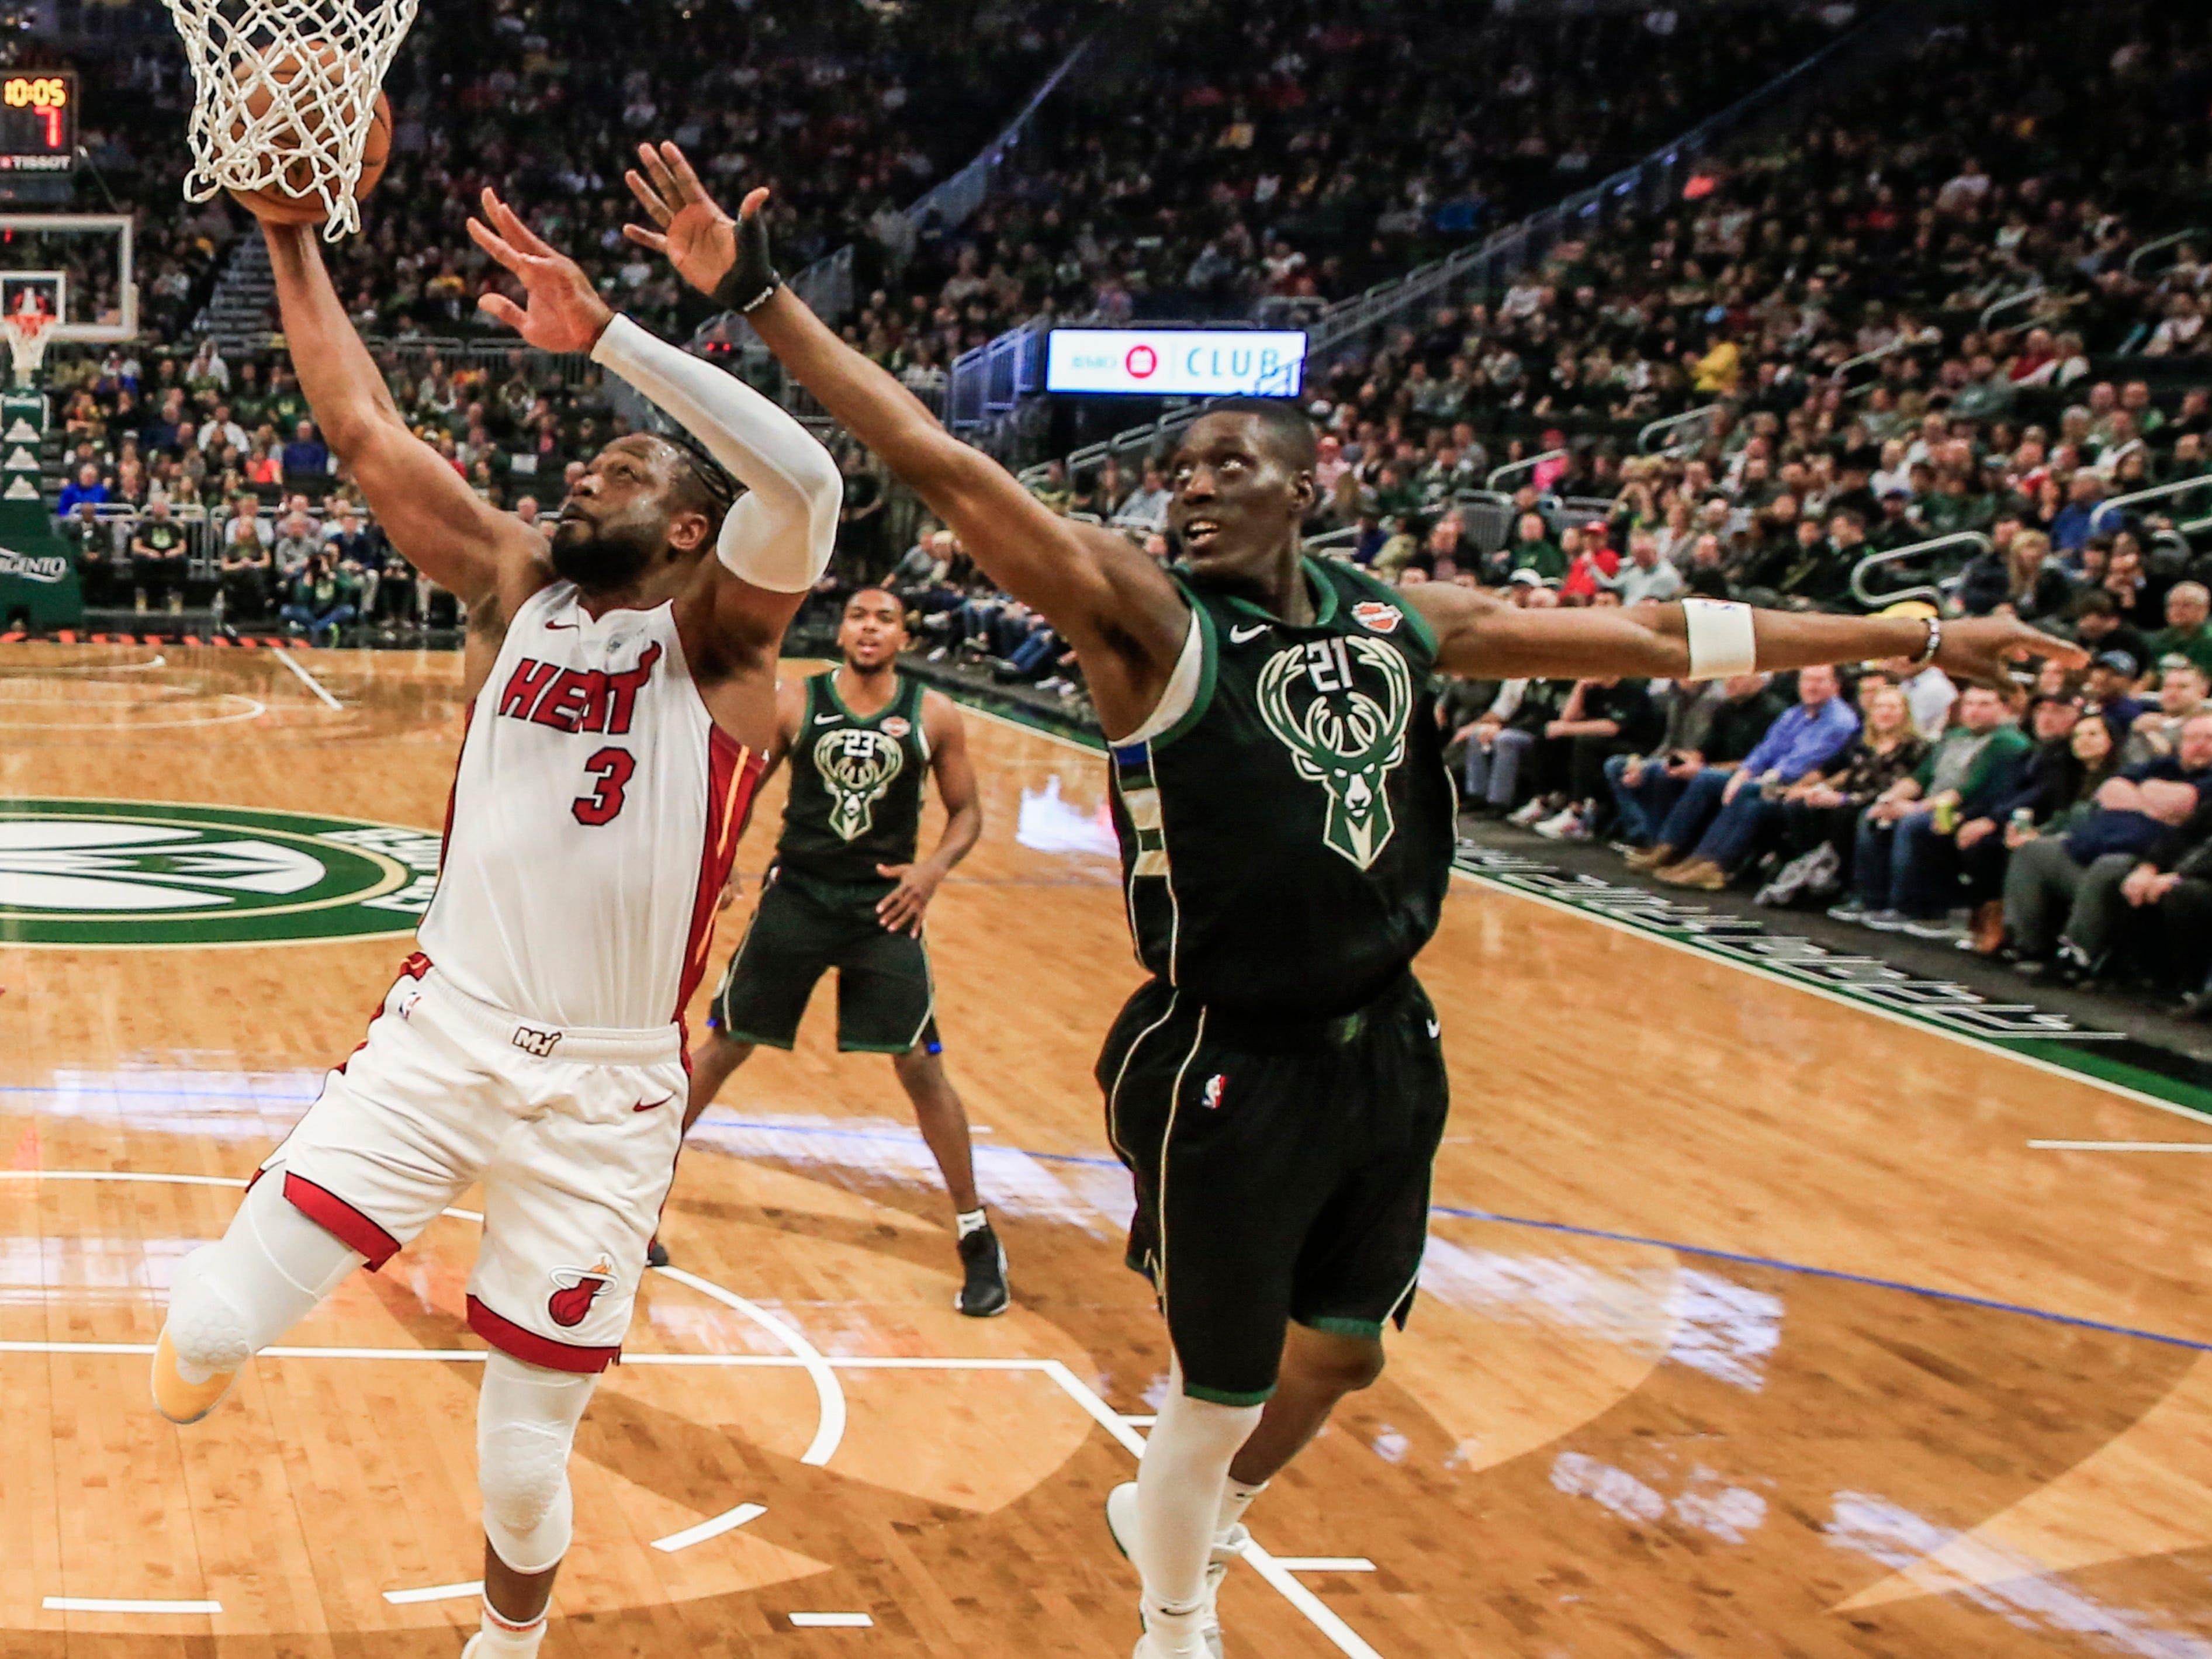 Heat guard Dwyane Wade beats Bucks guard Tony Snell to the basket for a layup Friday night.